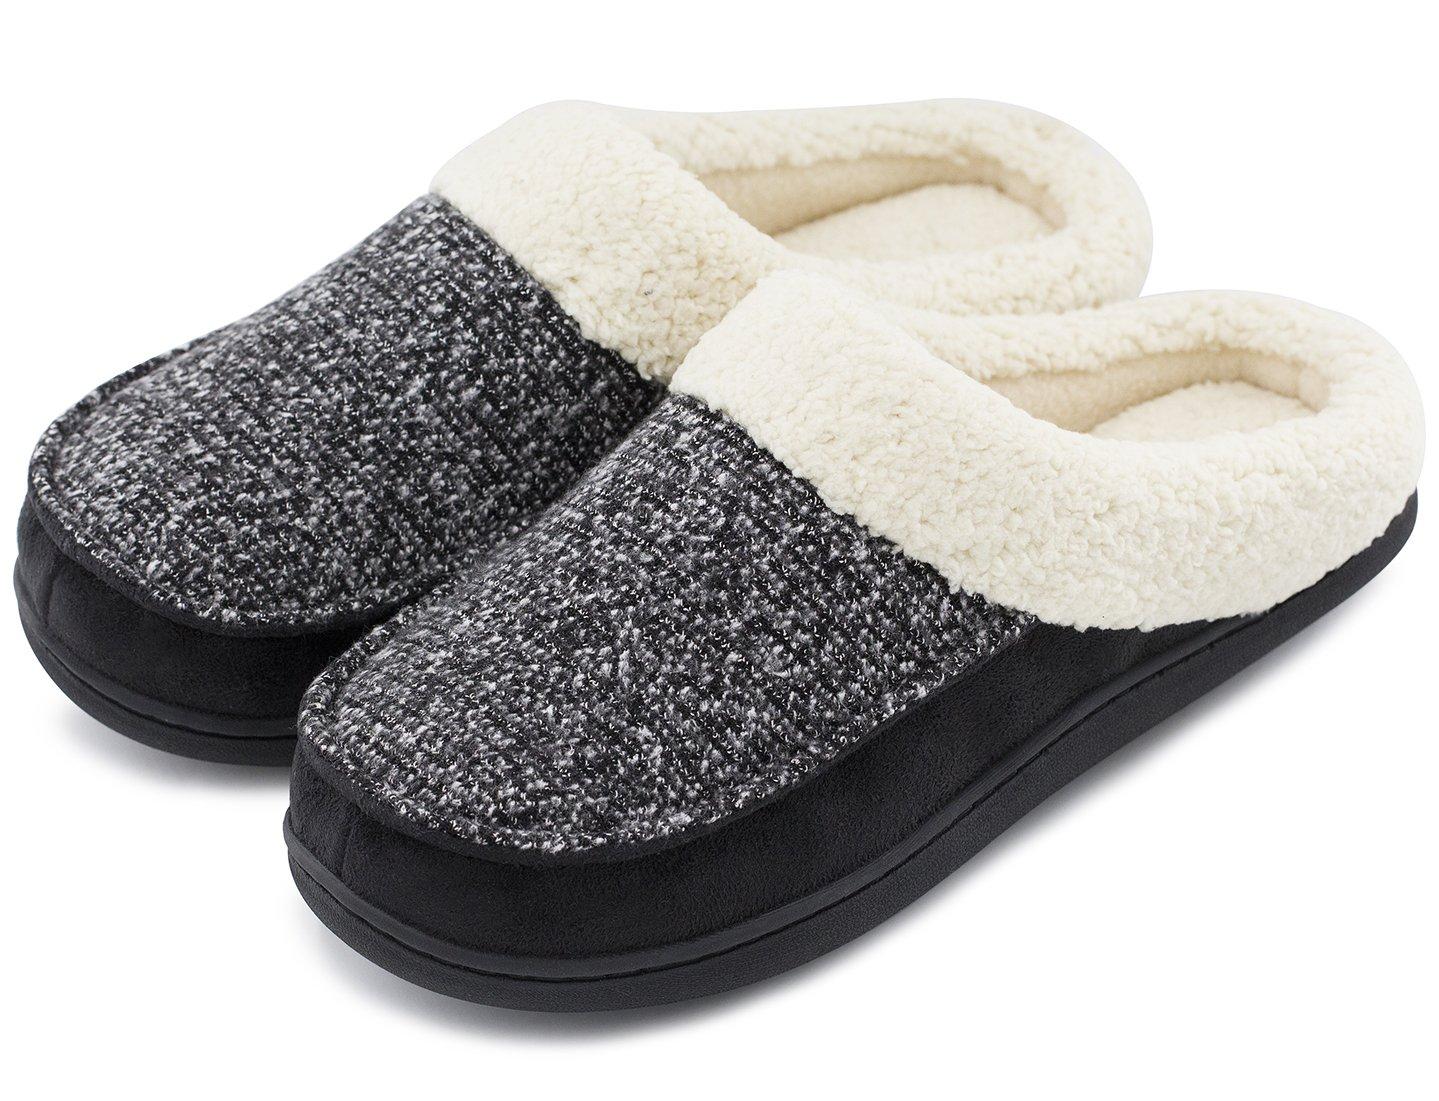 HomeTop, pantofole da donna in lana di tweed, con memory foam nero